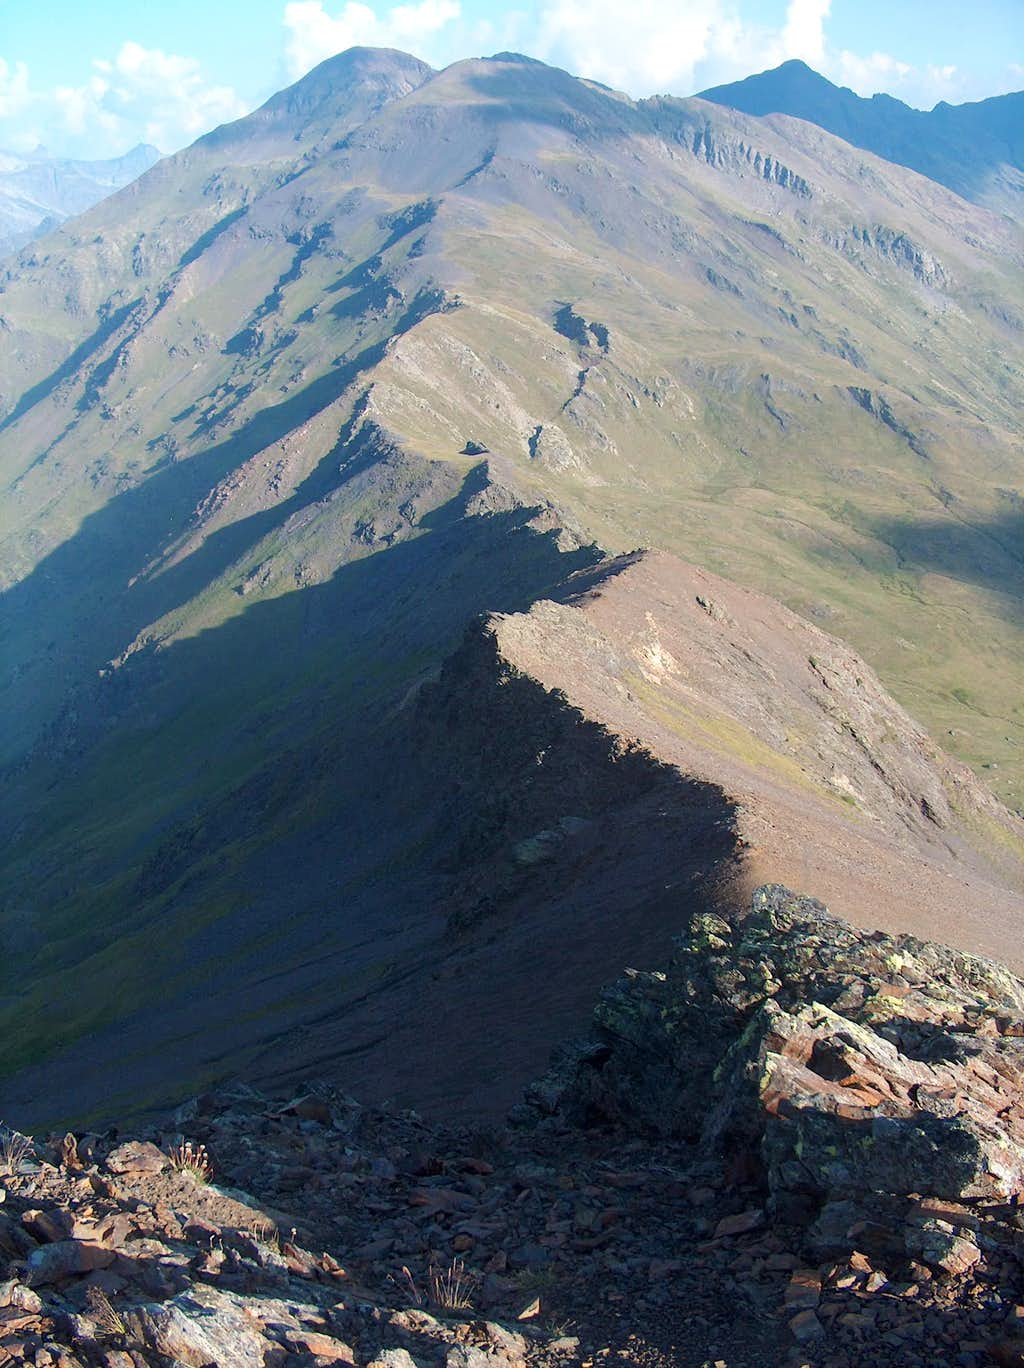 From Pico d'Ordiceto, West ridge